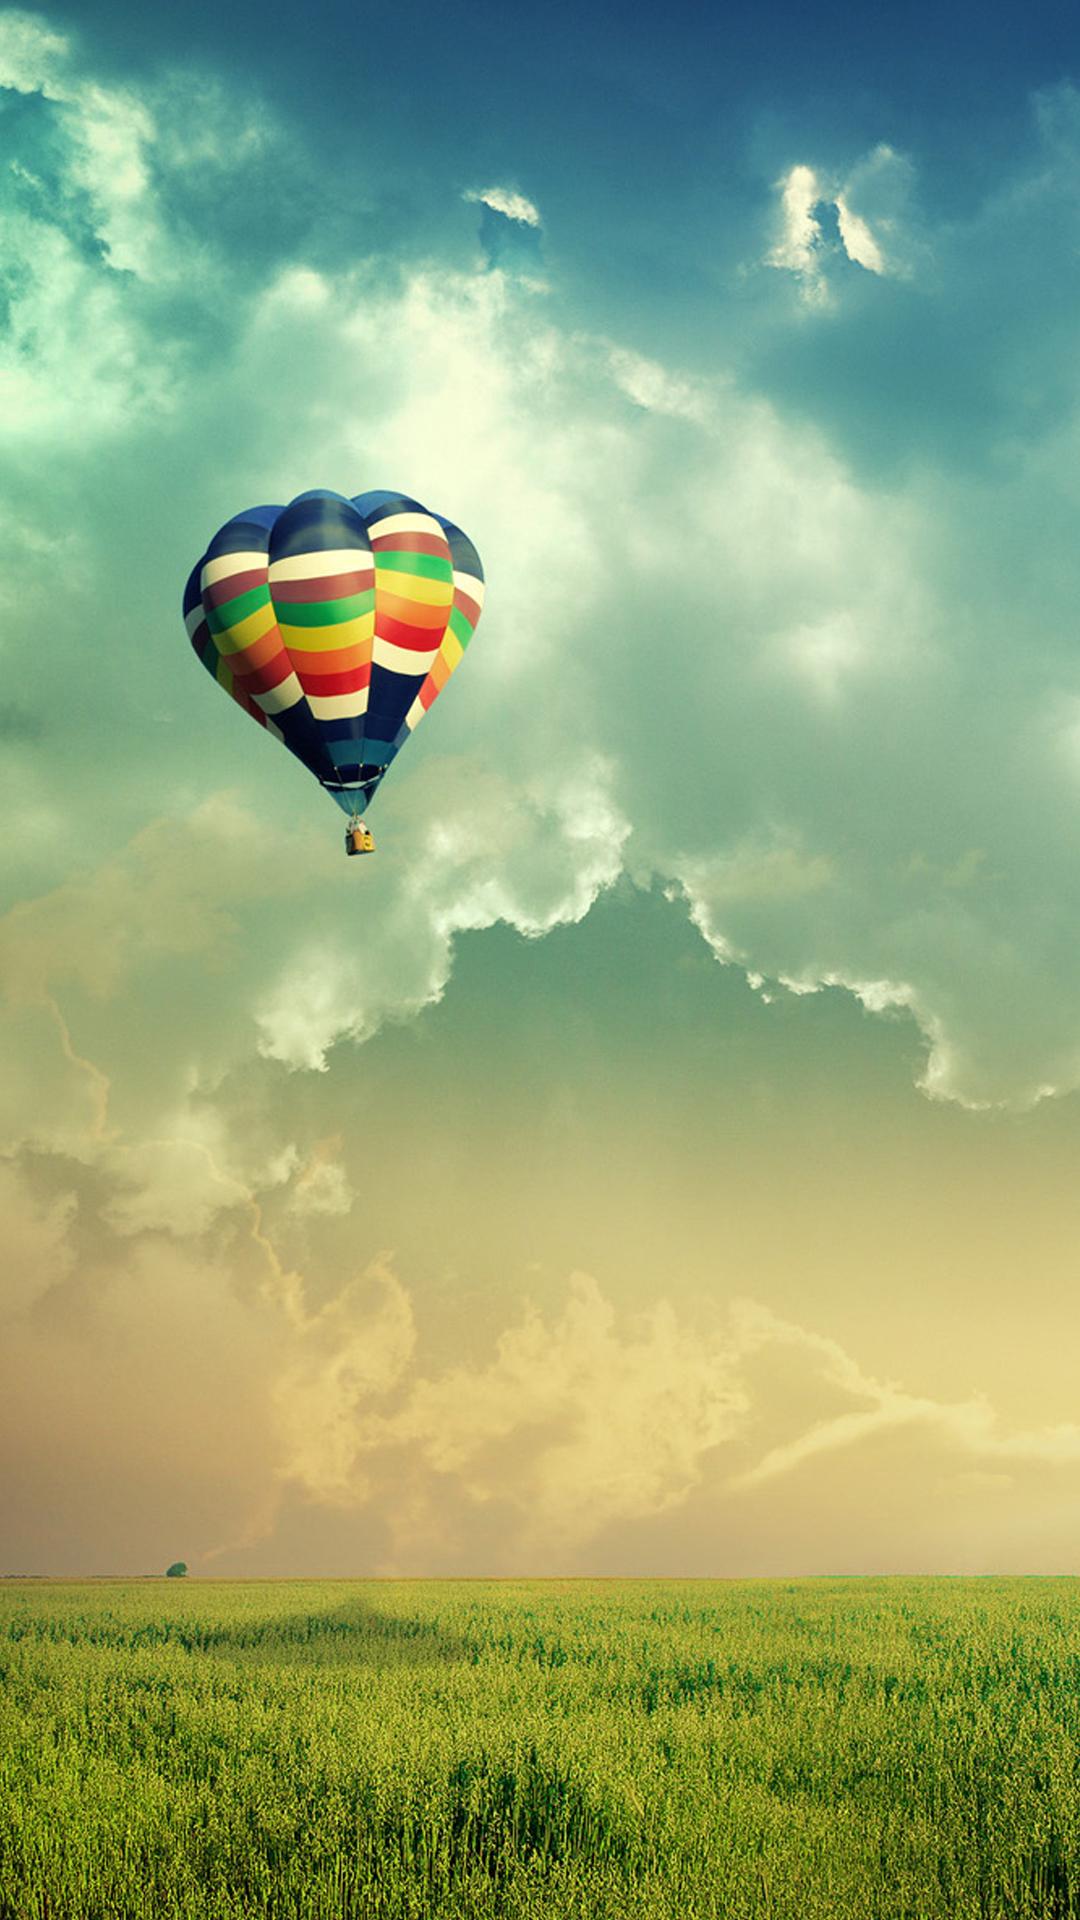 Hot Air Baloon Smartphone Hd Wallpapers Smartphone Wallpapers Hd 1080x1920 Download Hd Wallpaper Wallpapertip